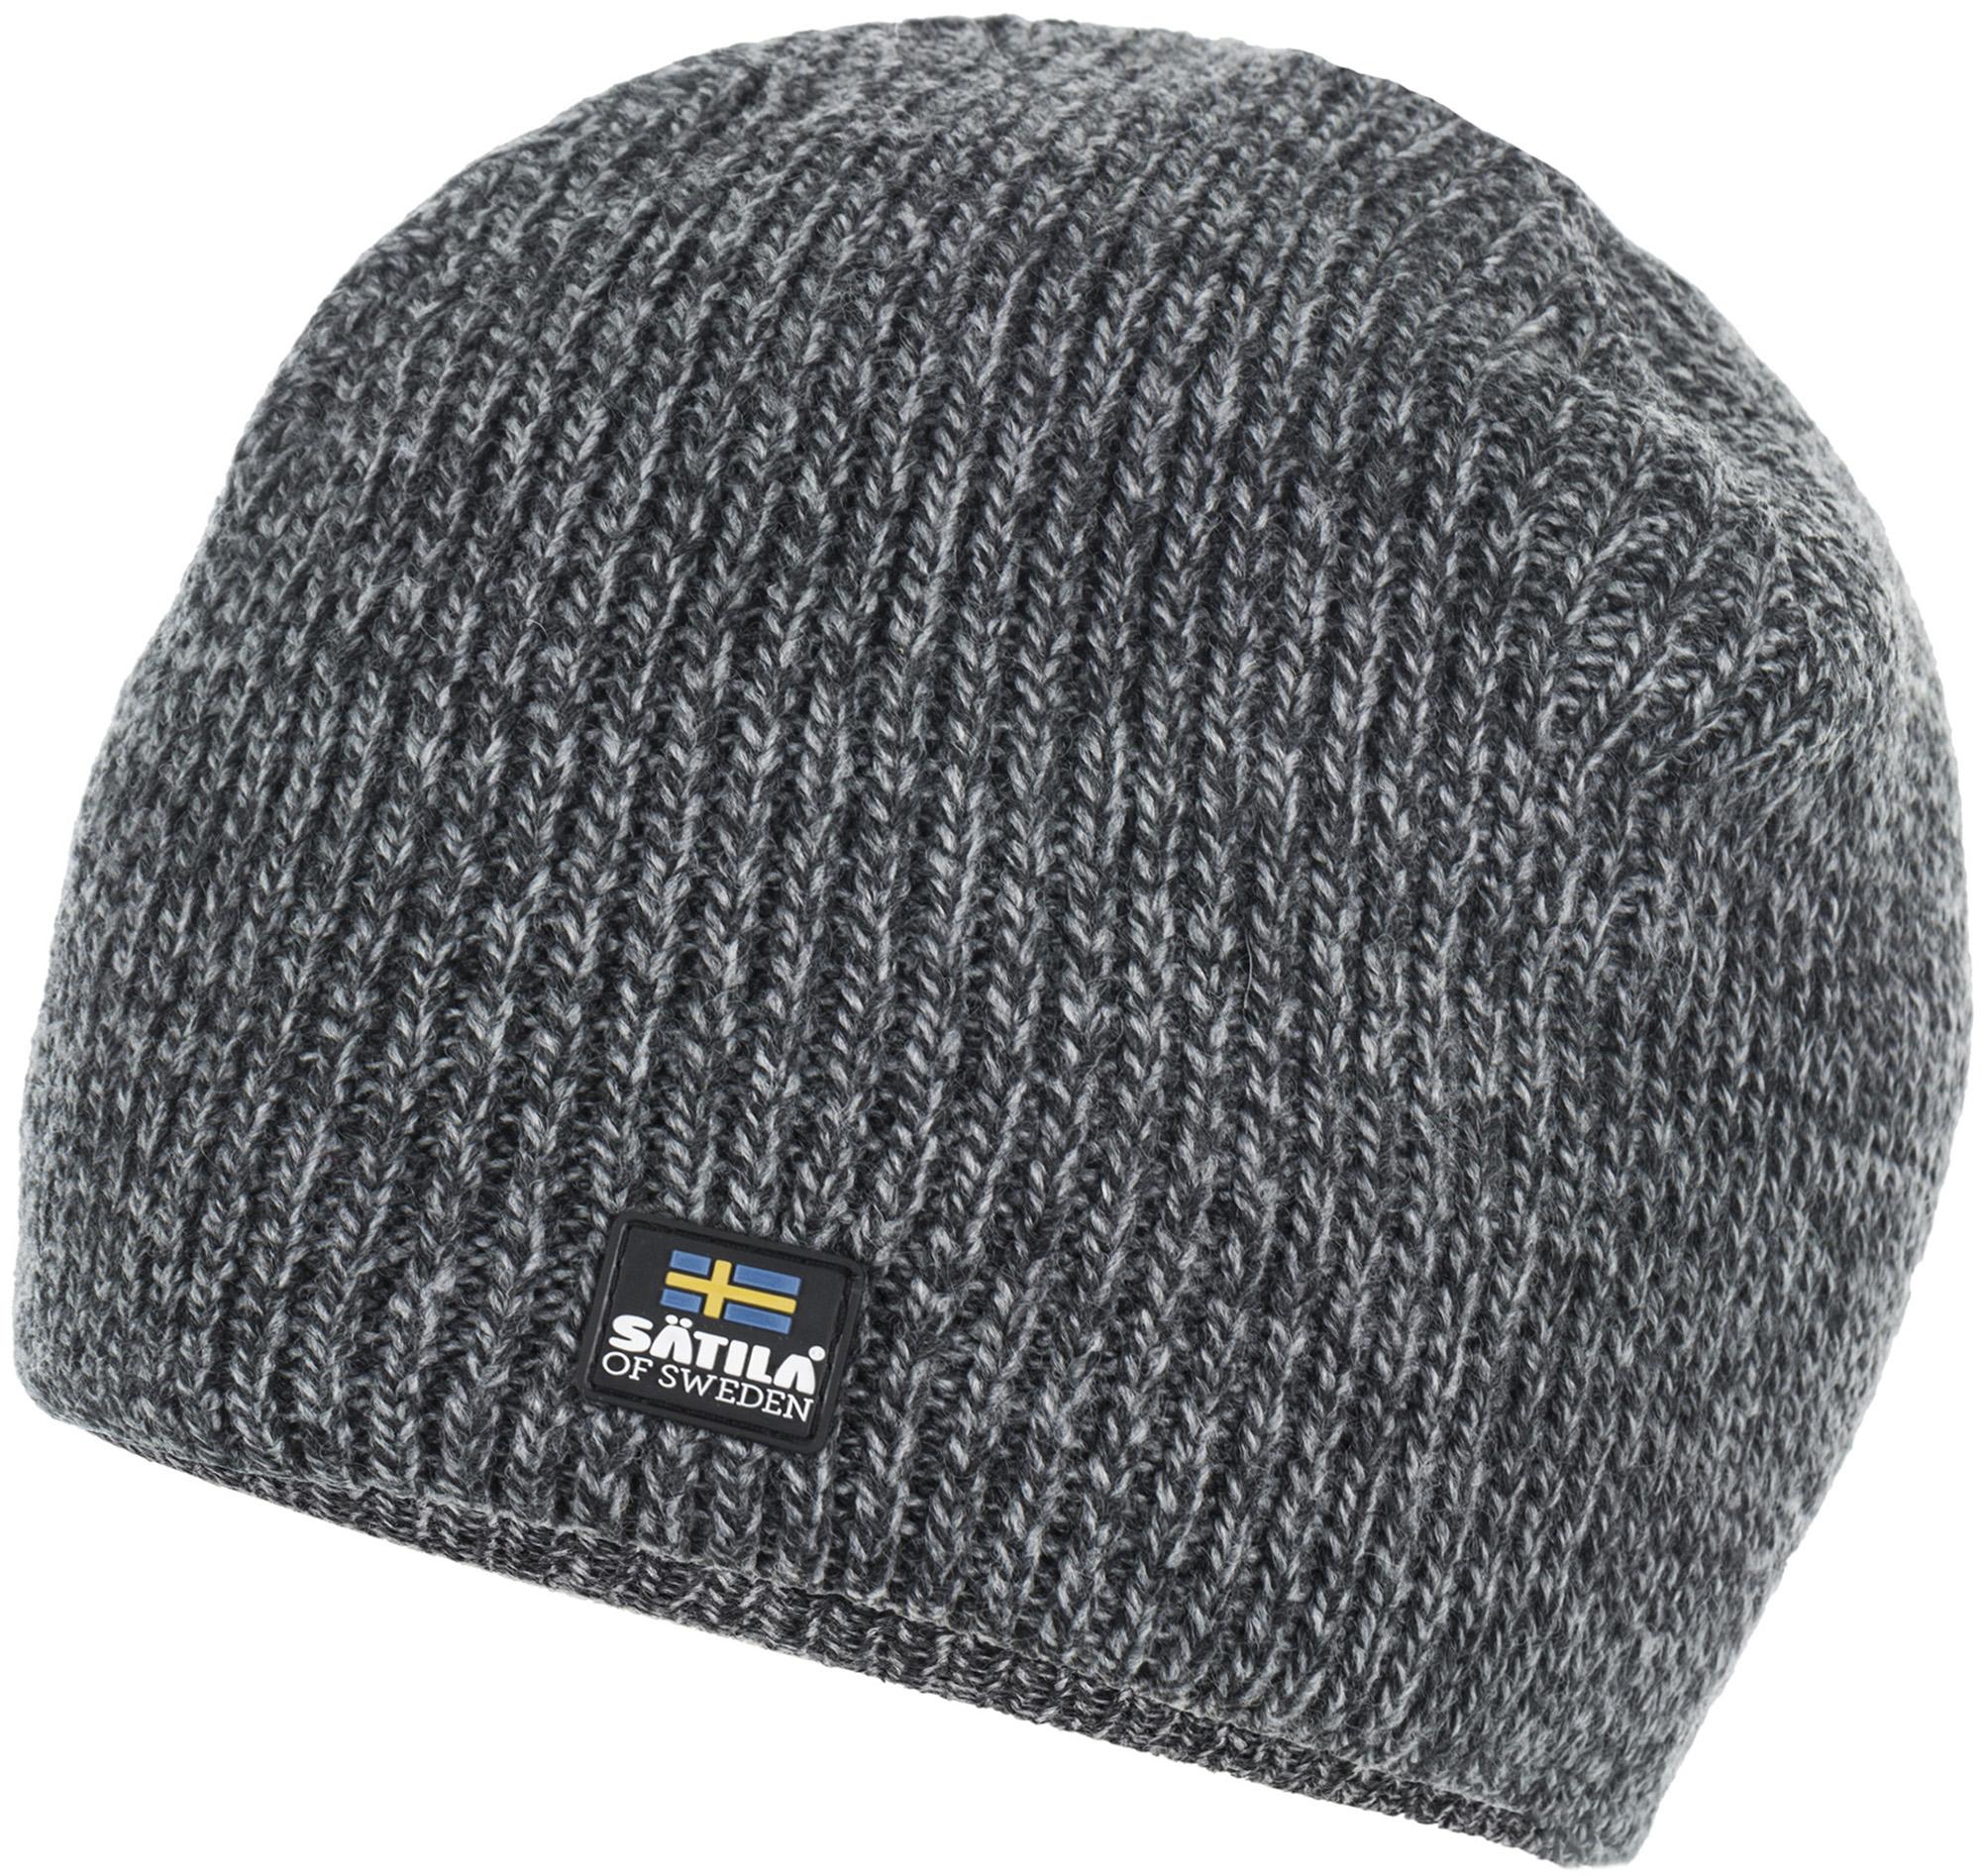 Satila Шапка Satila Moirana, размер 58 satila шапка satila reflect размер 58